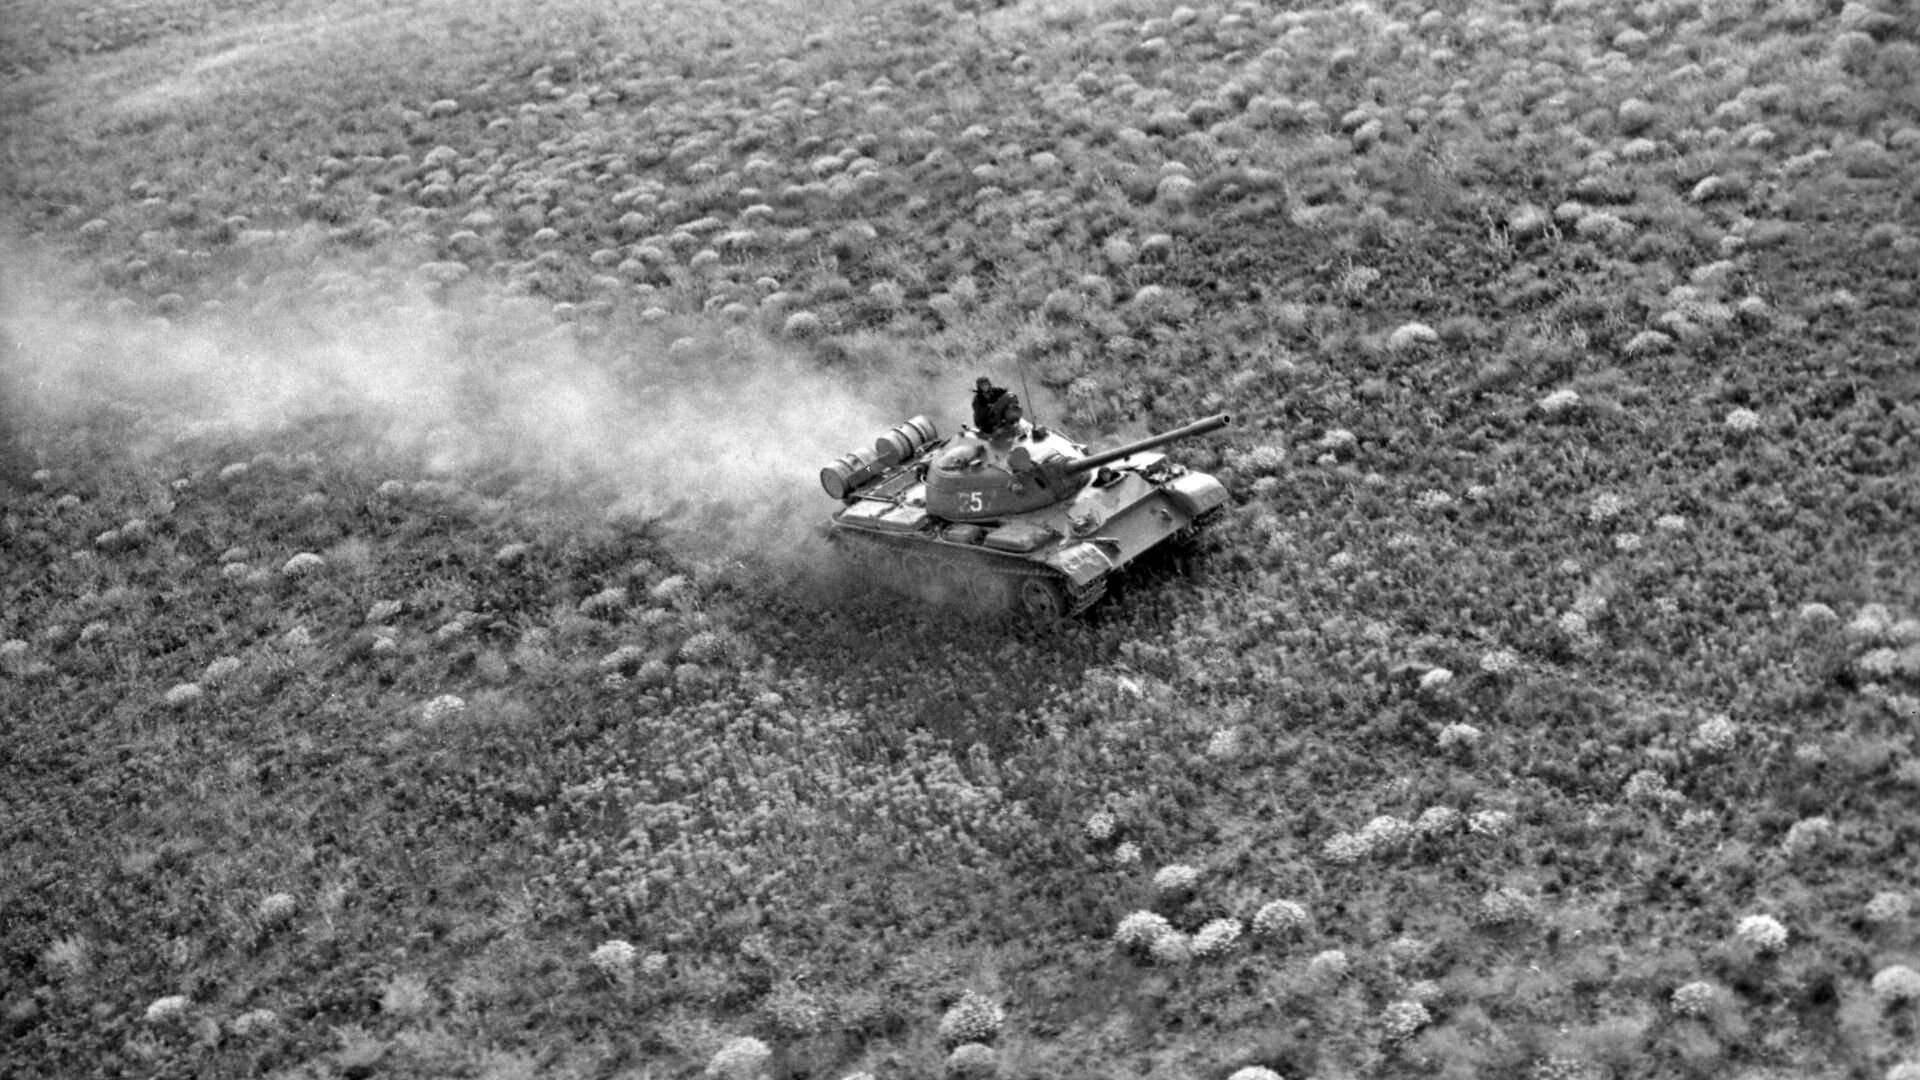 Т-55 tank, Rusya - Sputnik Türkiye, 1920, 01.09.2021